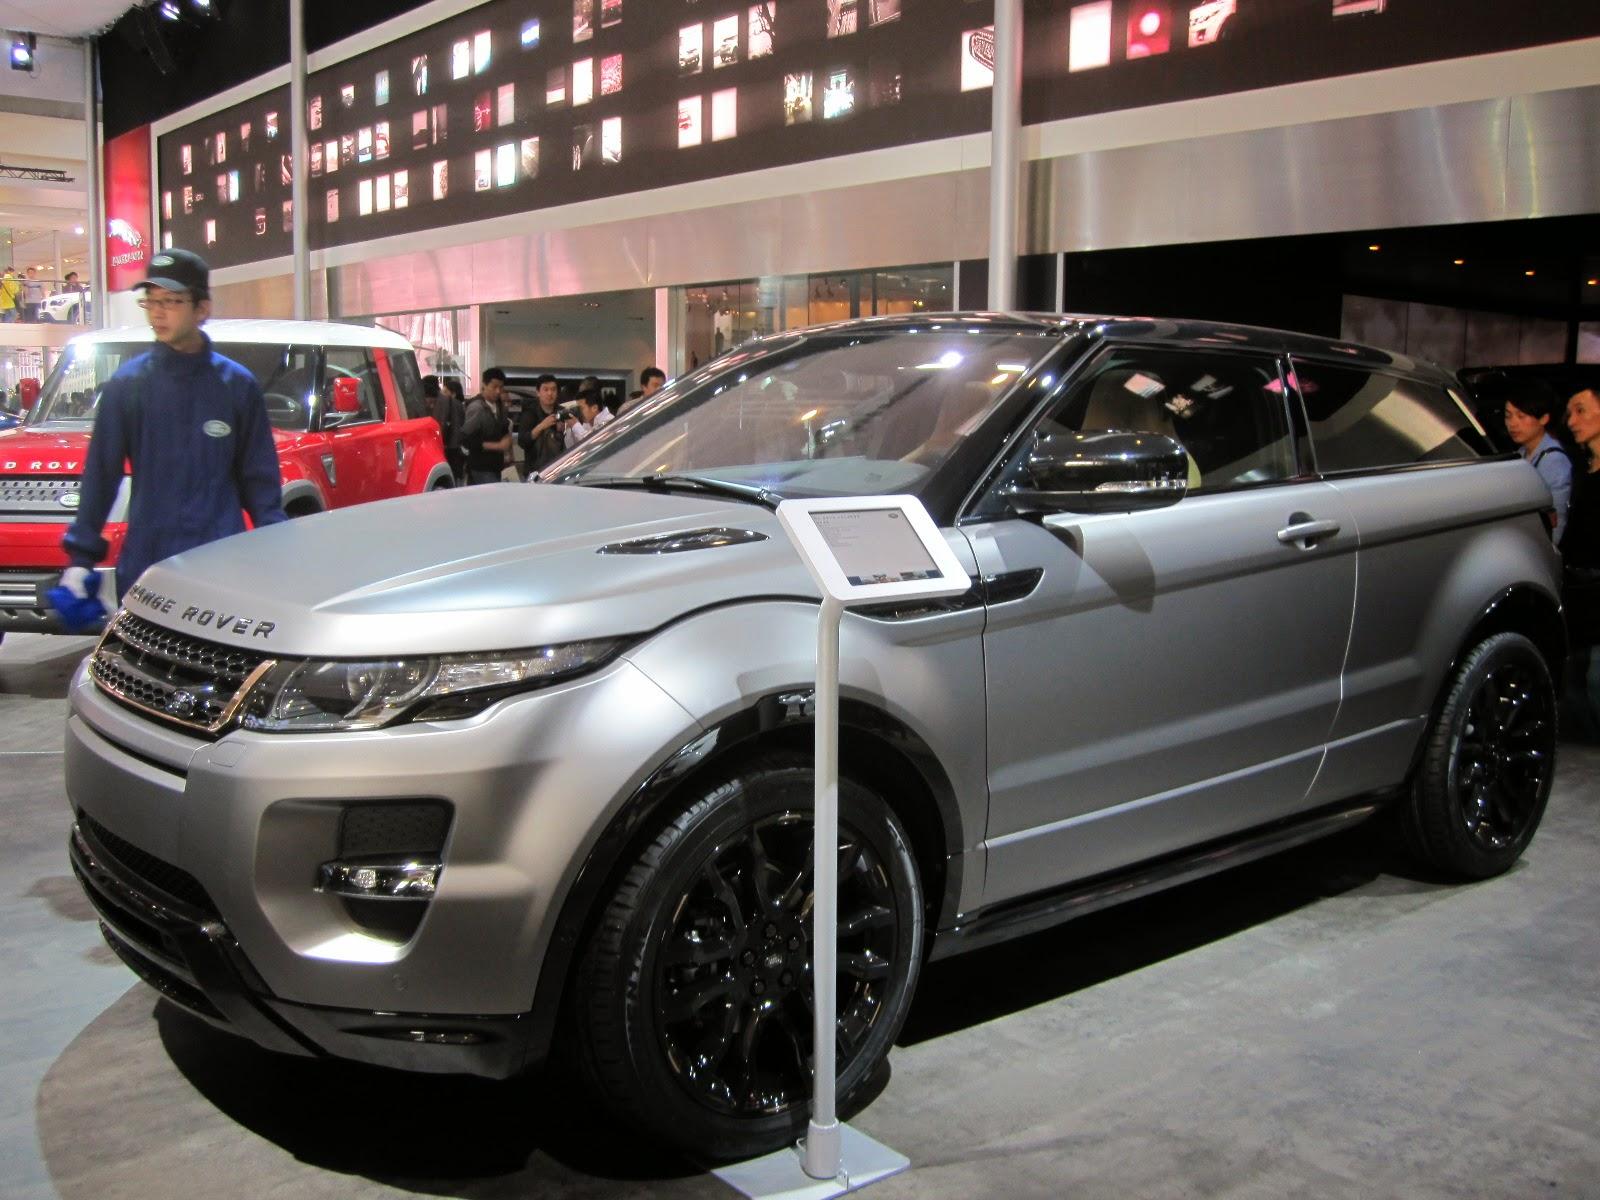 Range Rover Evoque Special Edition With Victoria Beckham at Auto